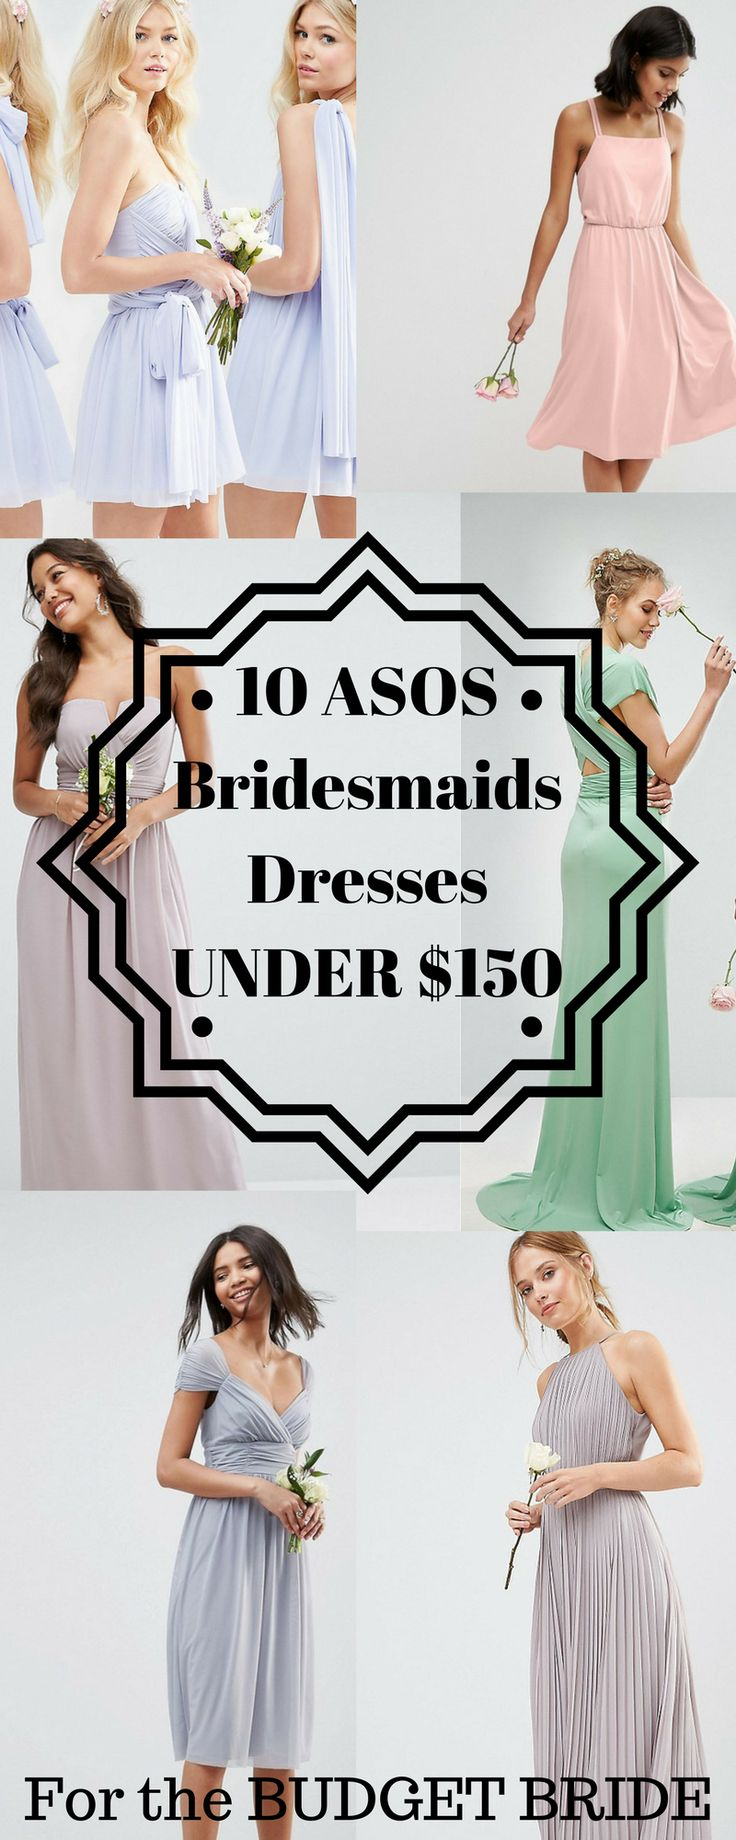 10 dresses that your Bridesmaids will ROCK, for under $150 !!!  #asos #bridesmaid #dresses #dress #afflink #wedding #budget